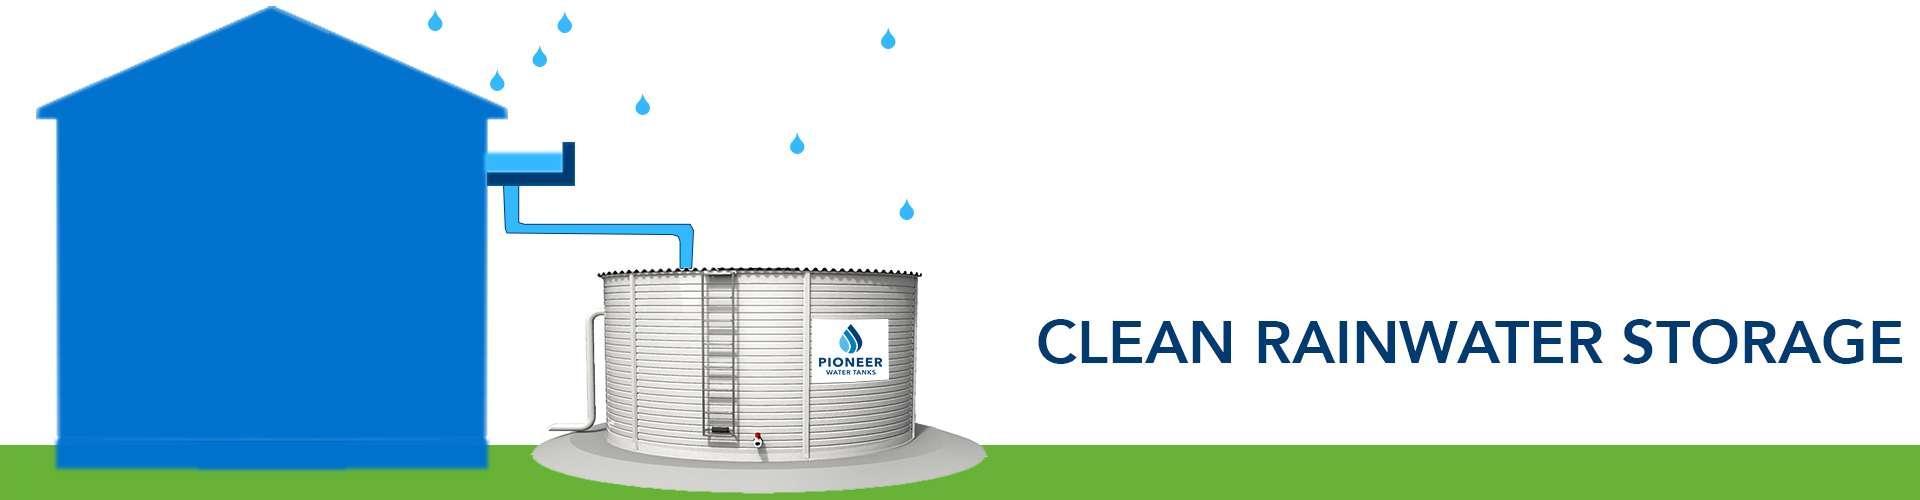 Texas rainwater tanks